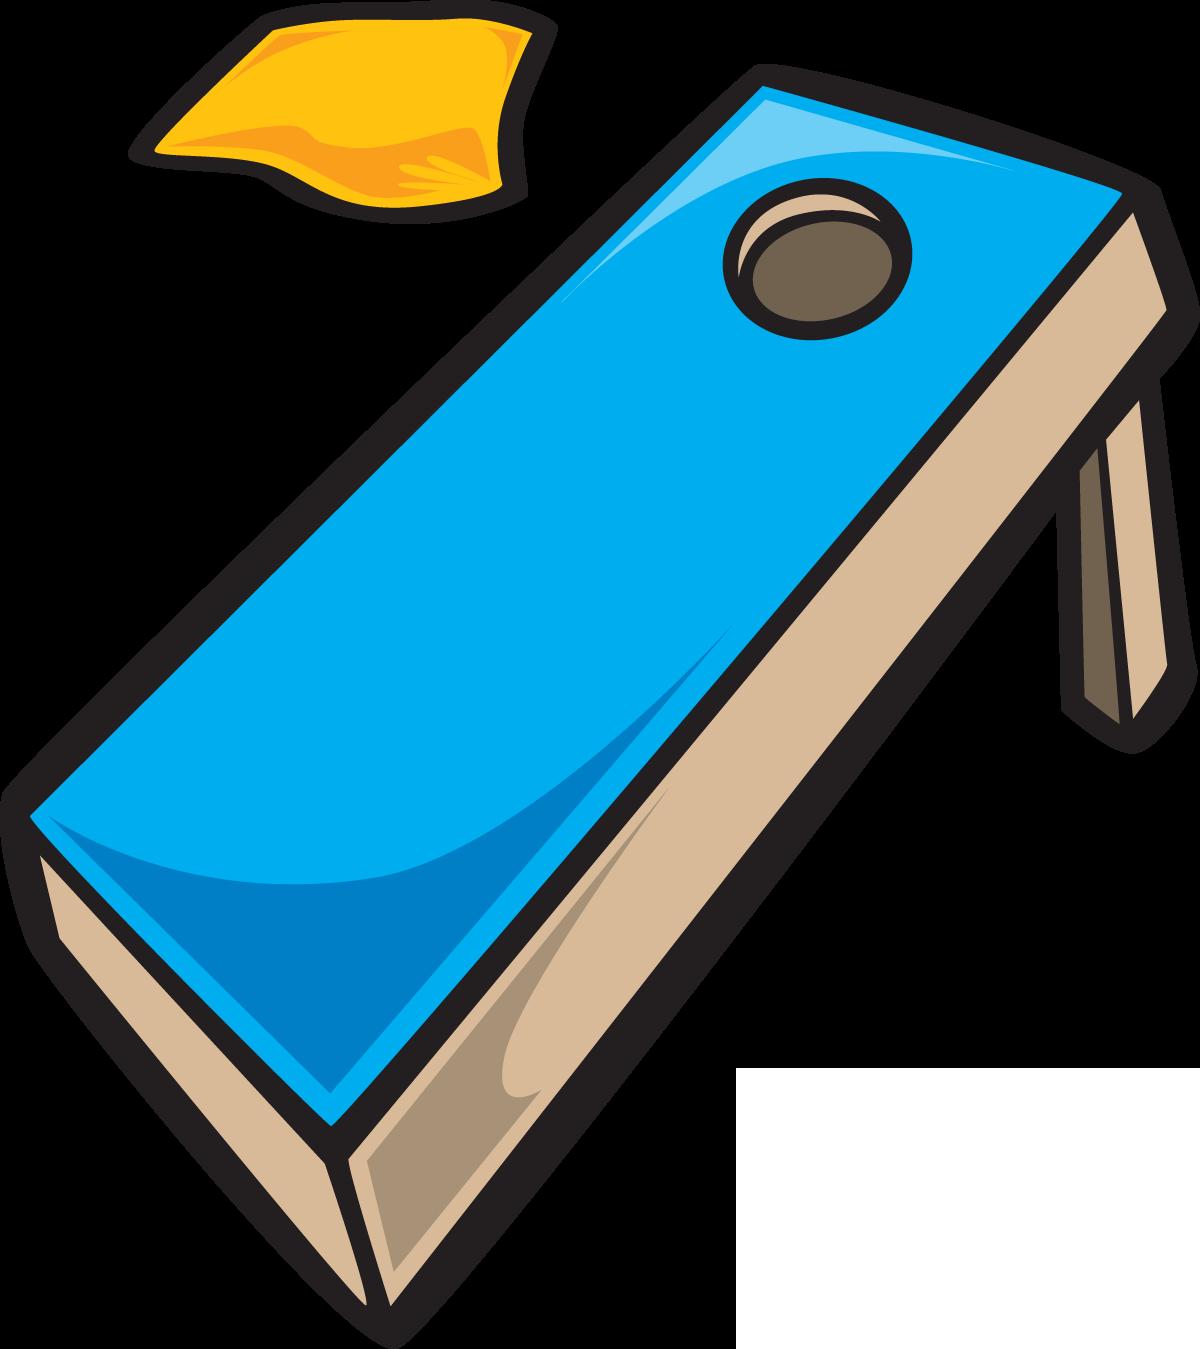 corn-hole-icon